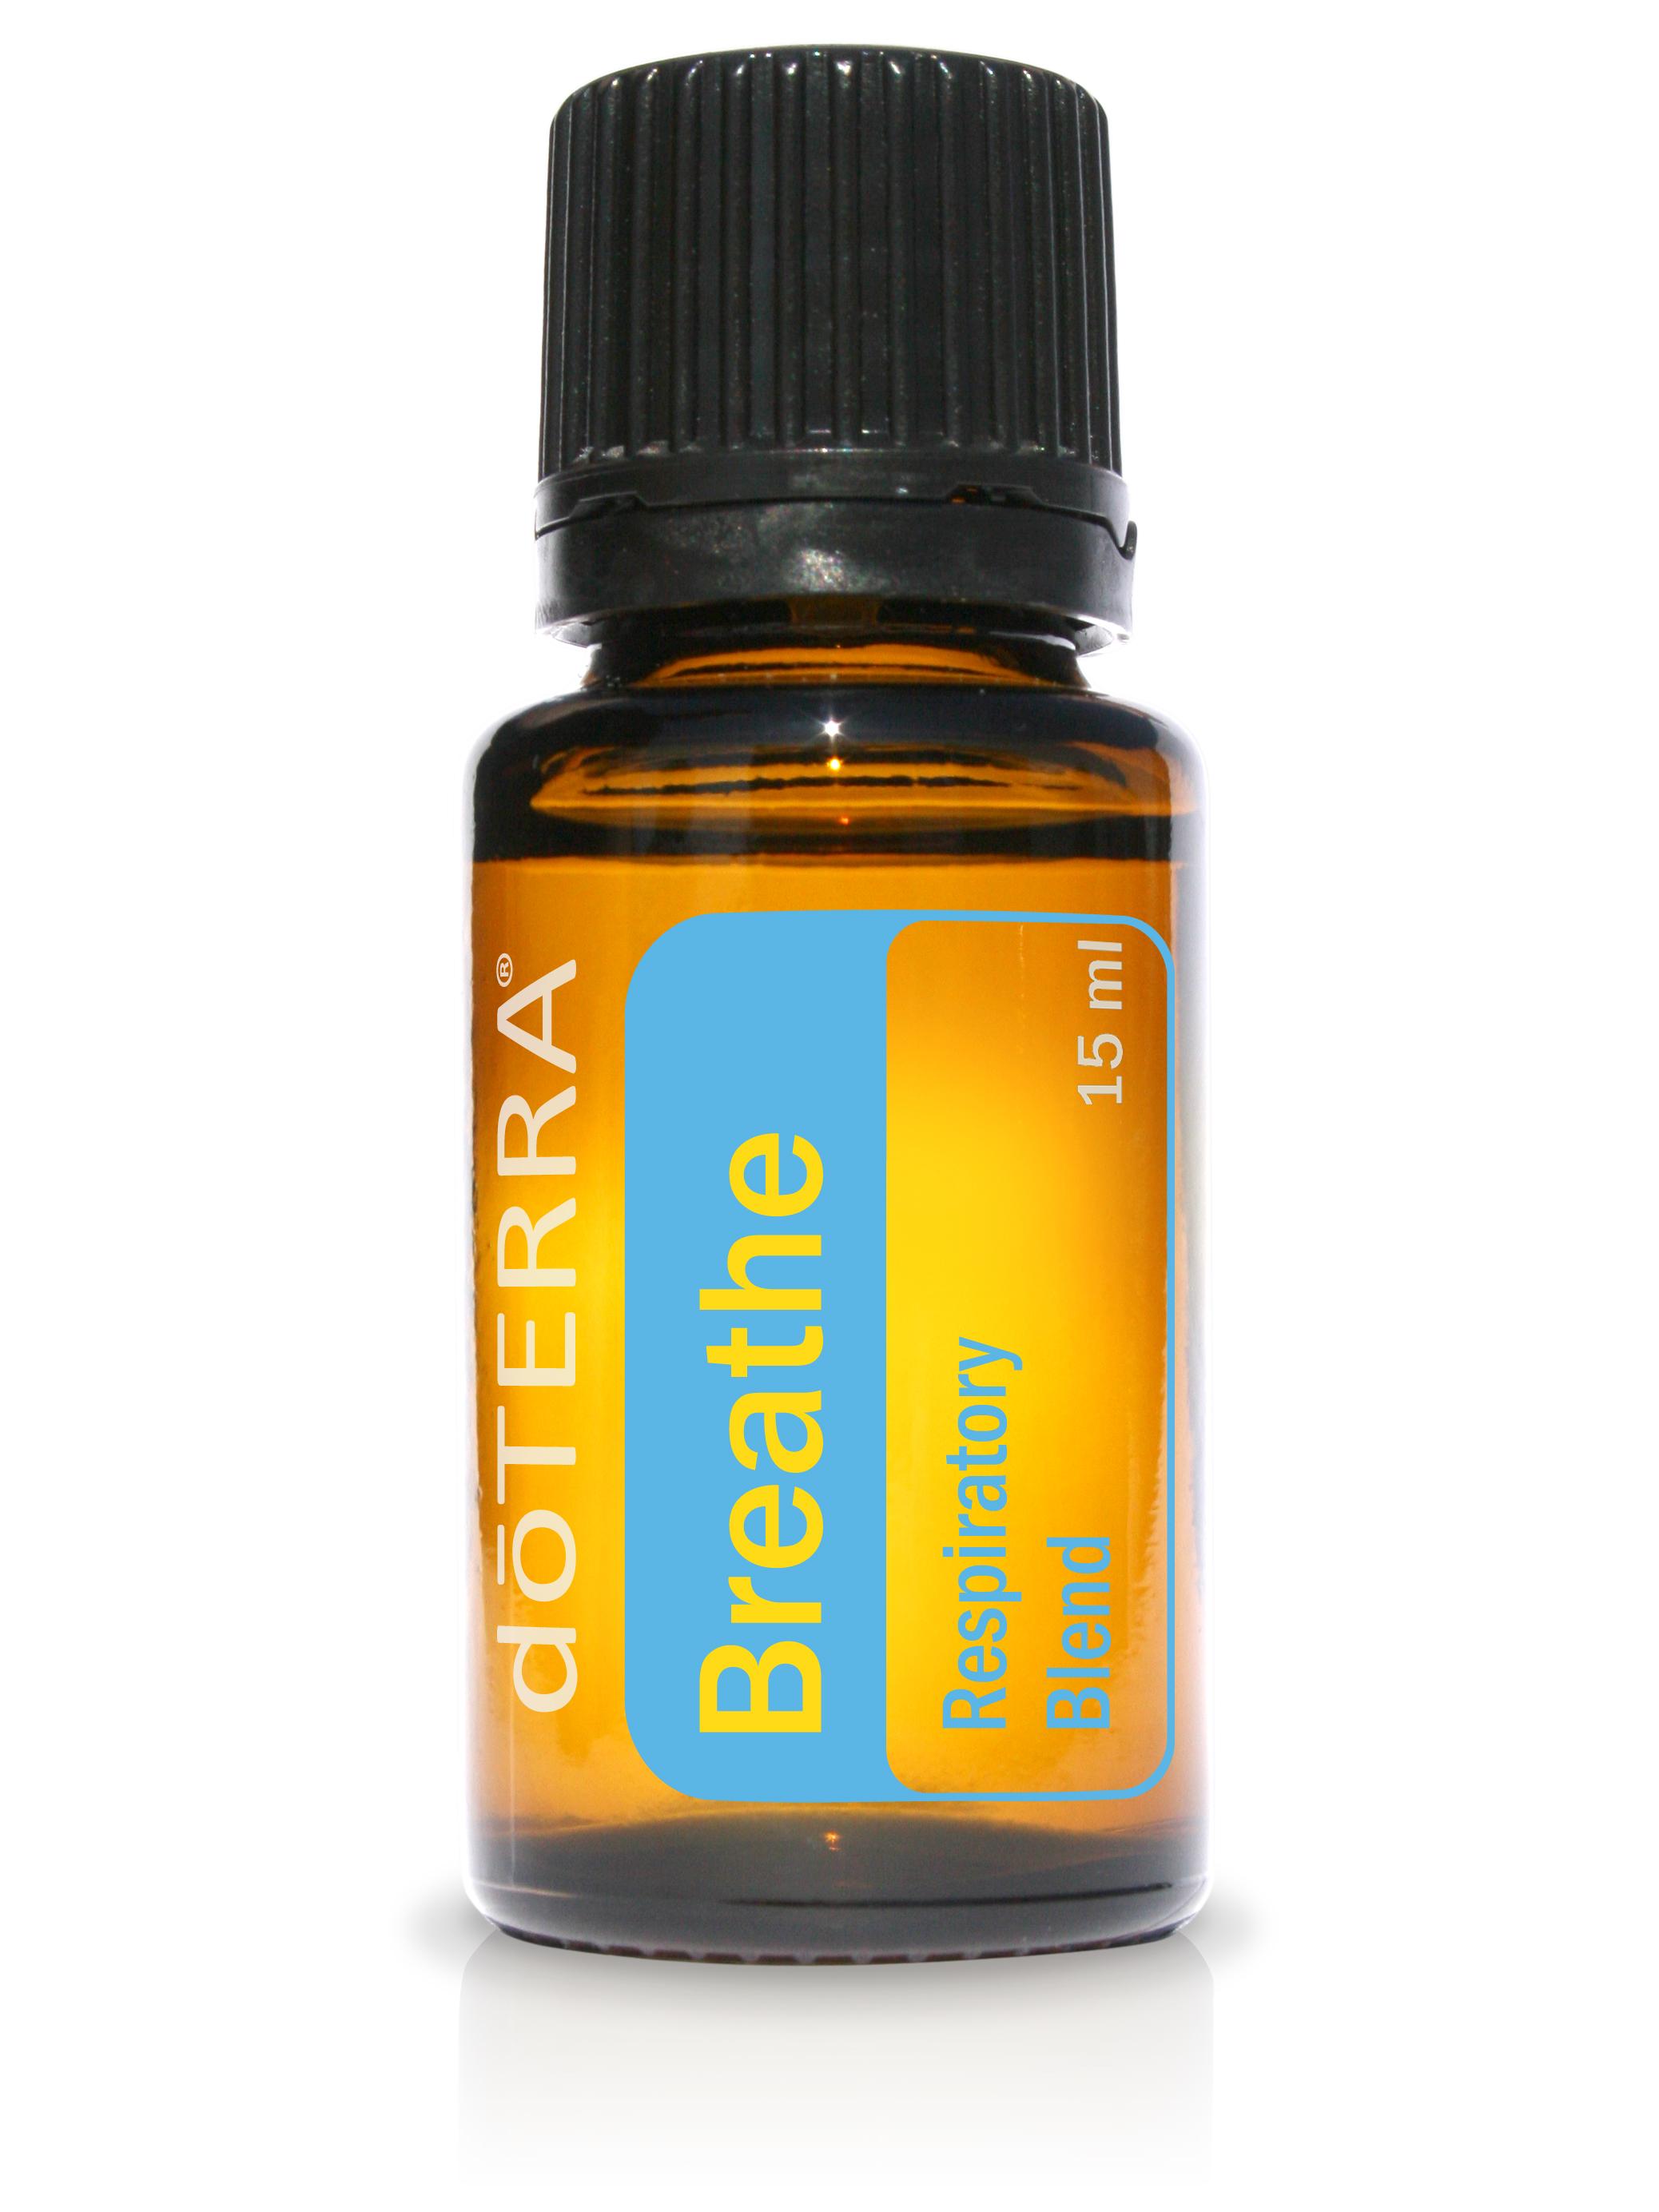 Breathe ™ Essential Oil Blend